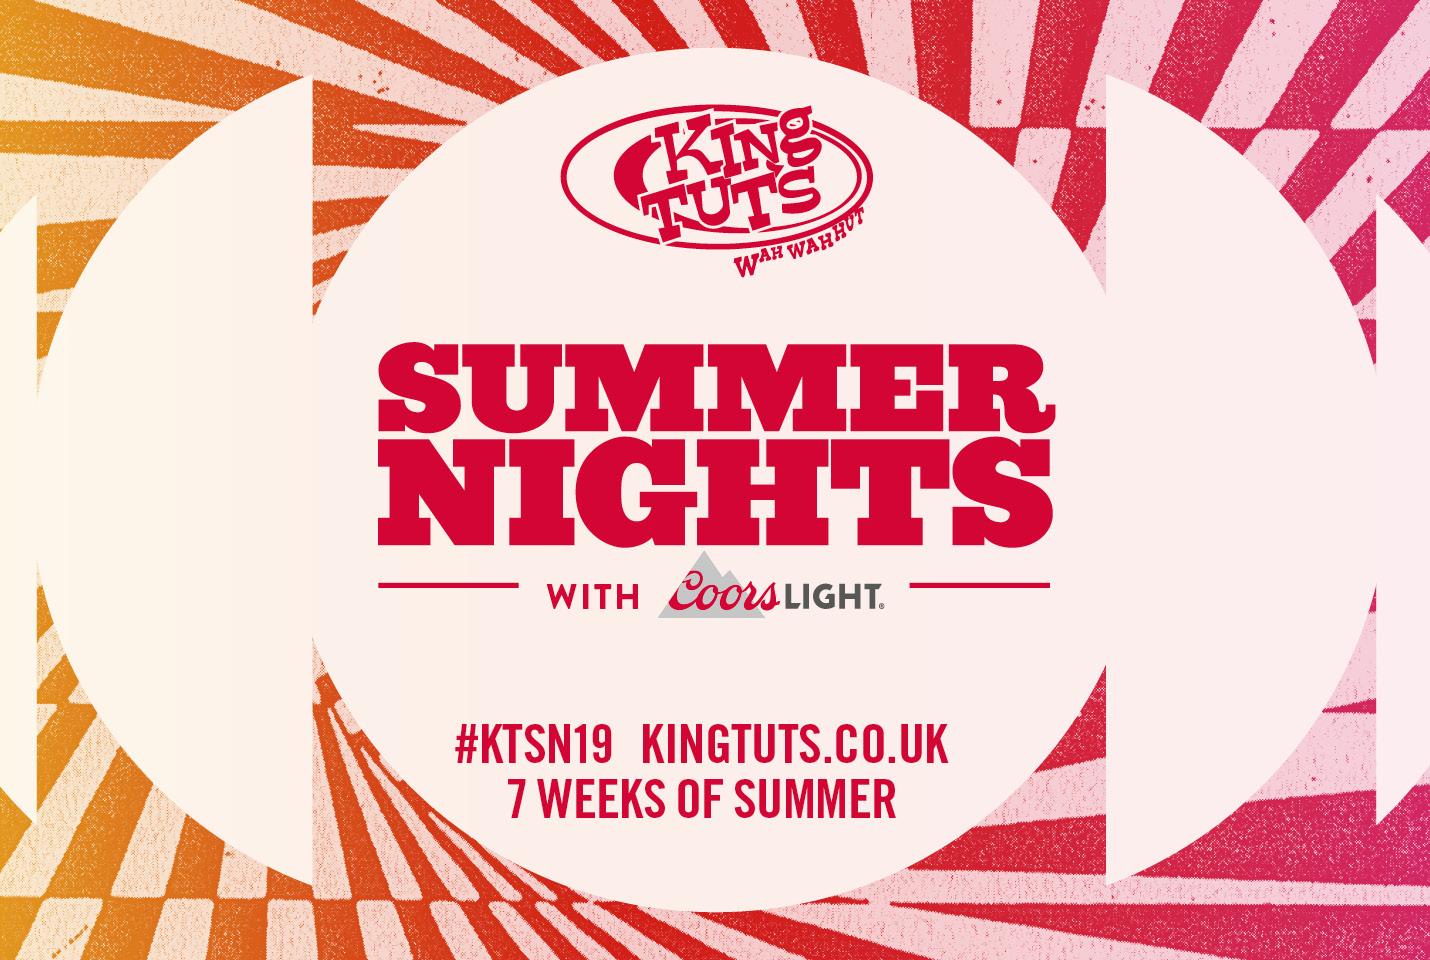 King Tut's Summer Nights 2019